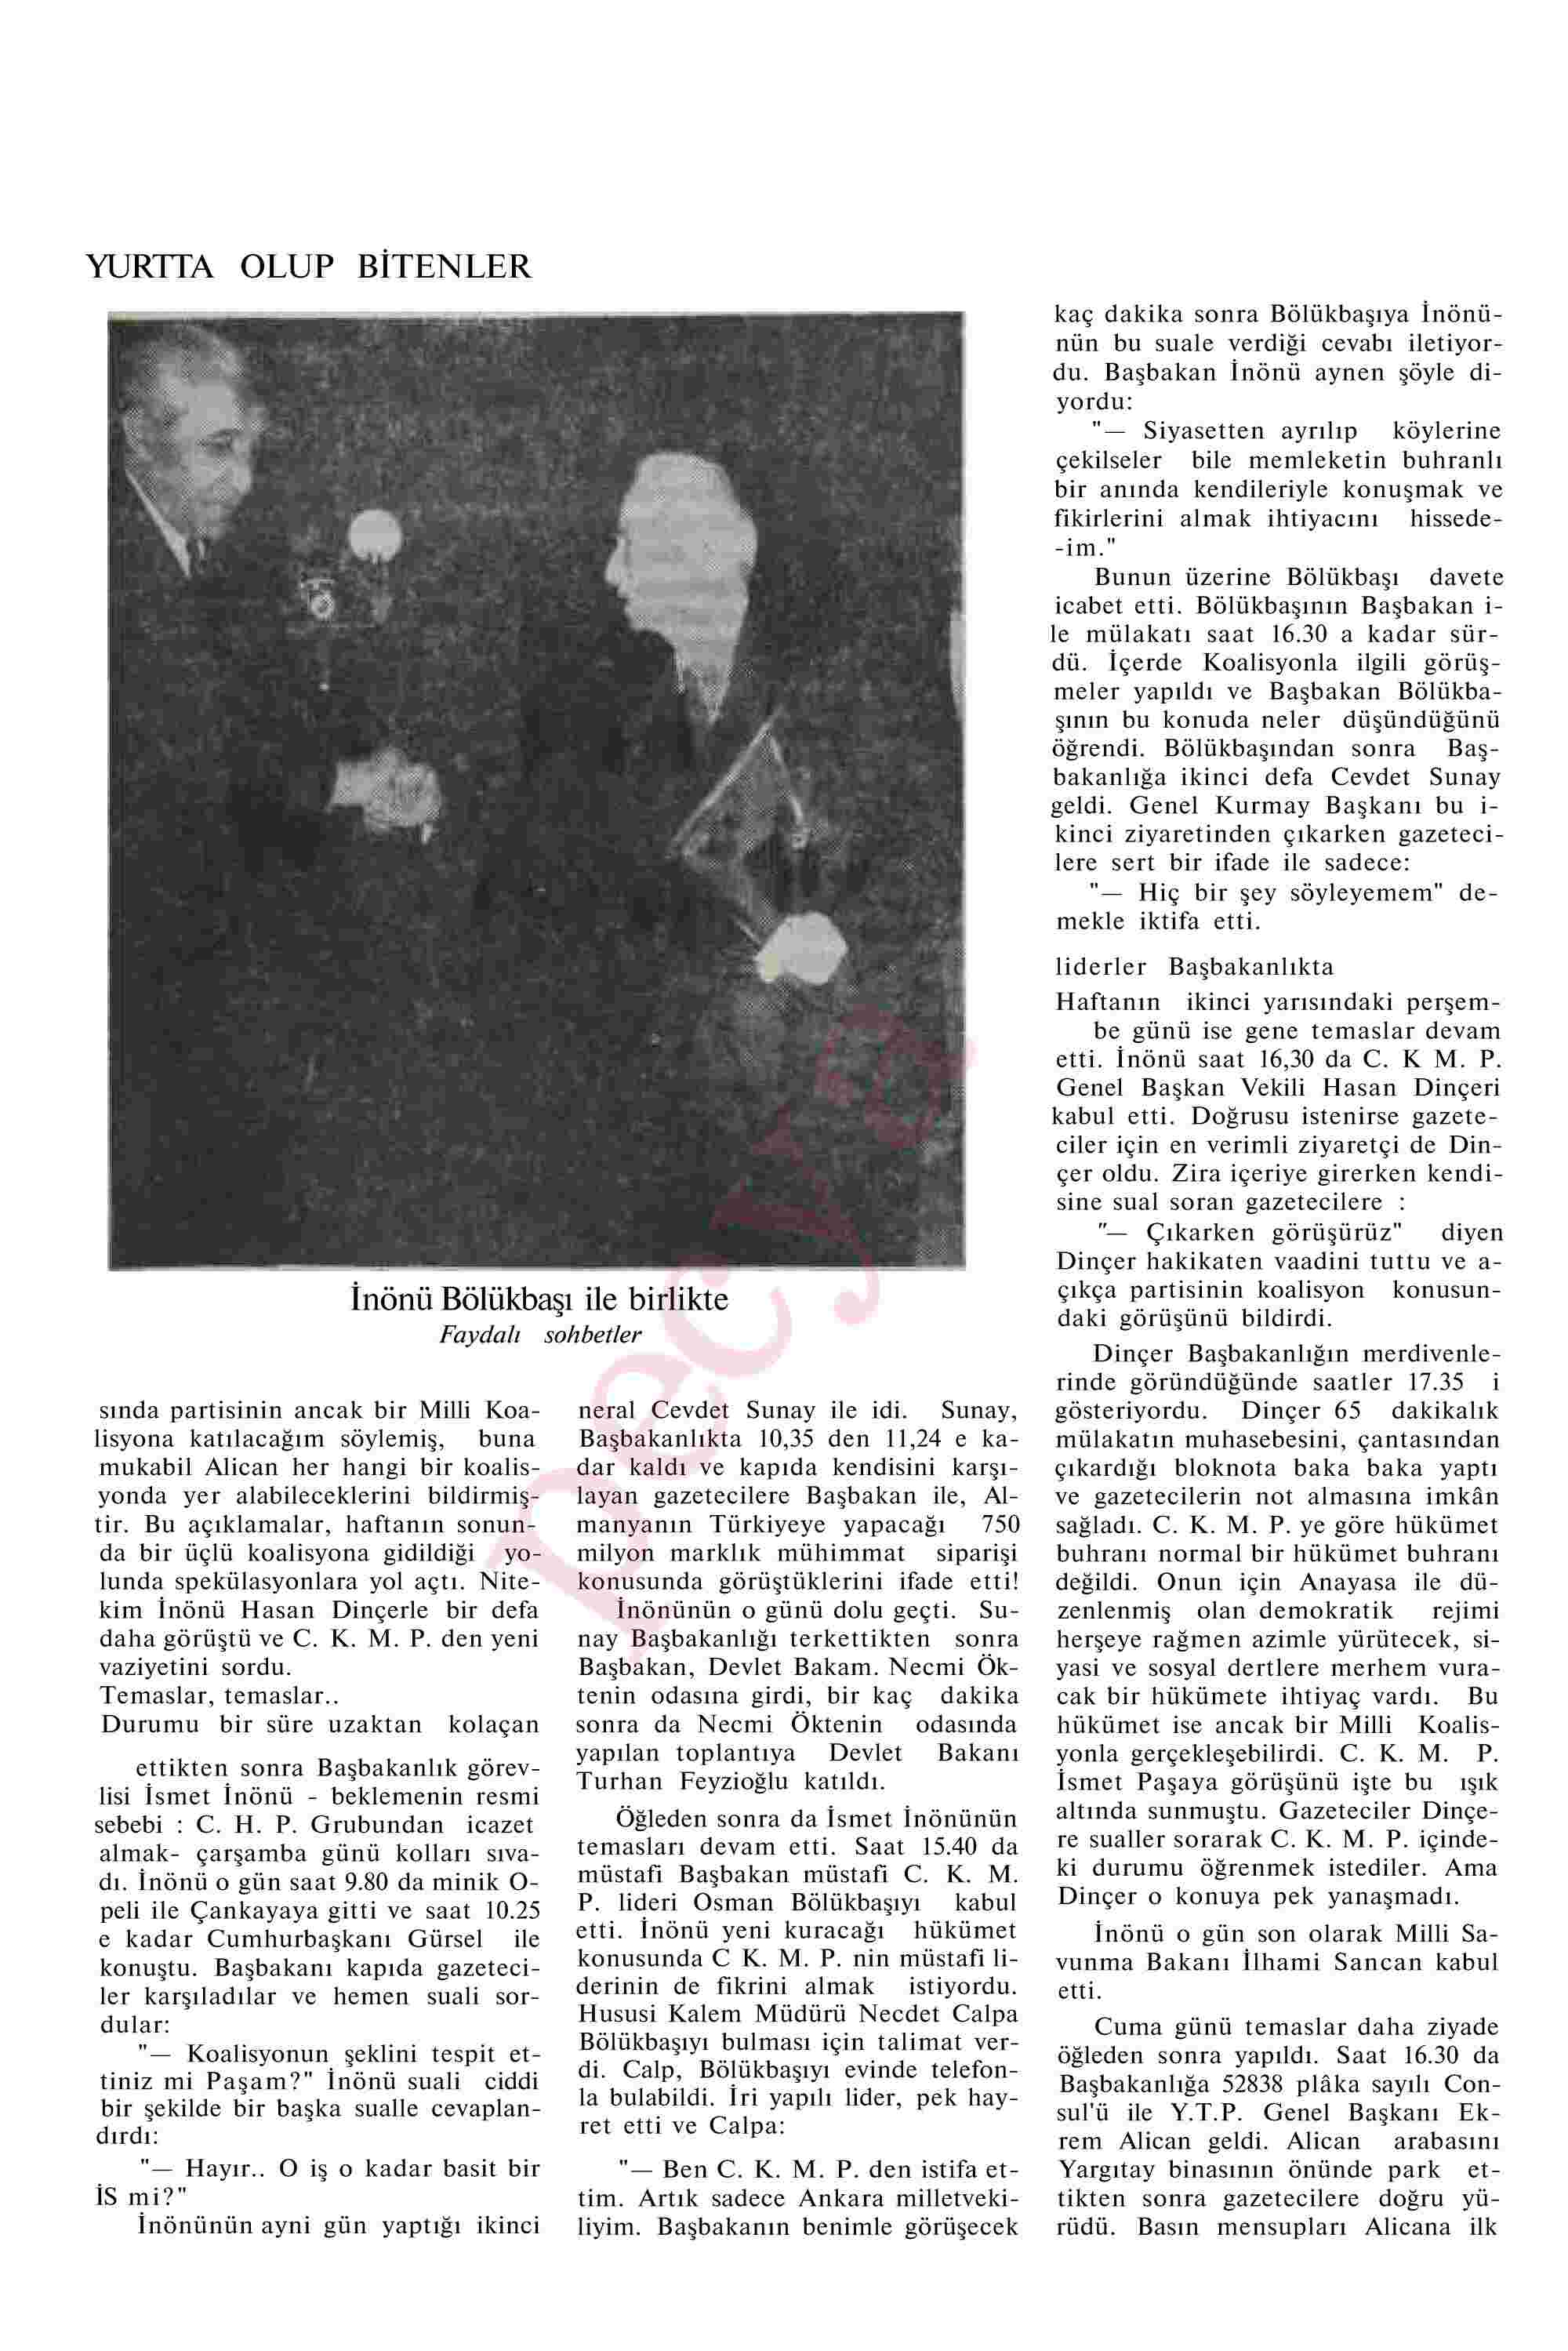 11 Haziran 1962 Tarihli Akis Dergisi Sayfa 12